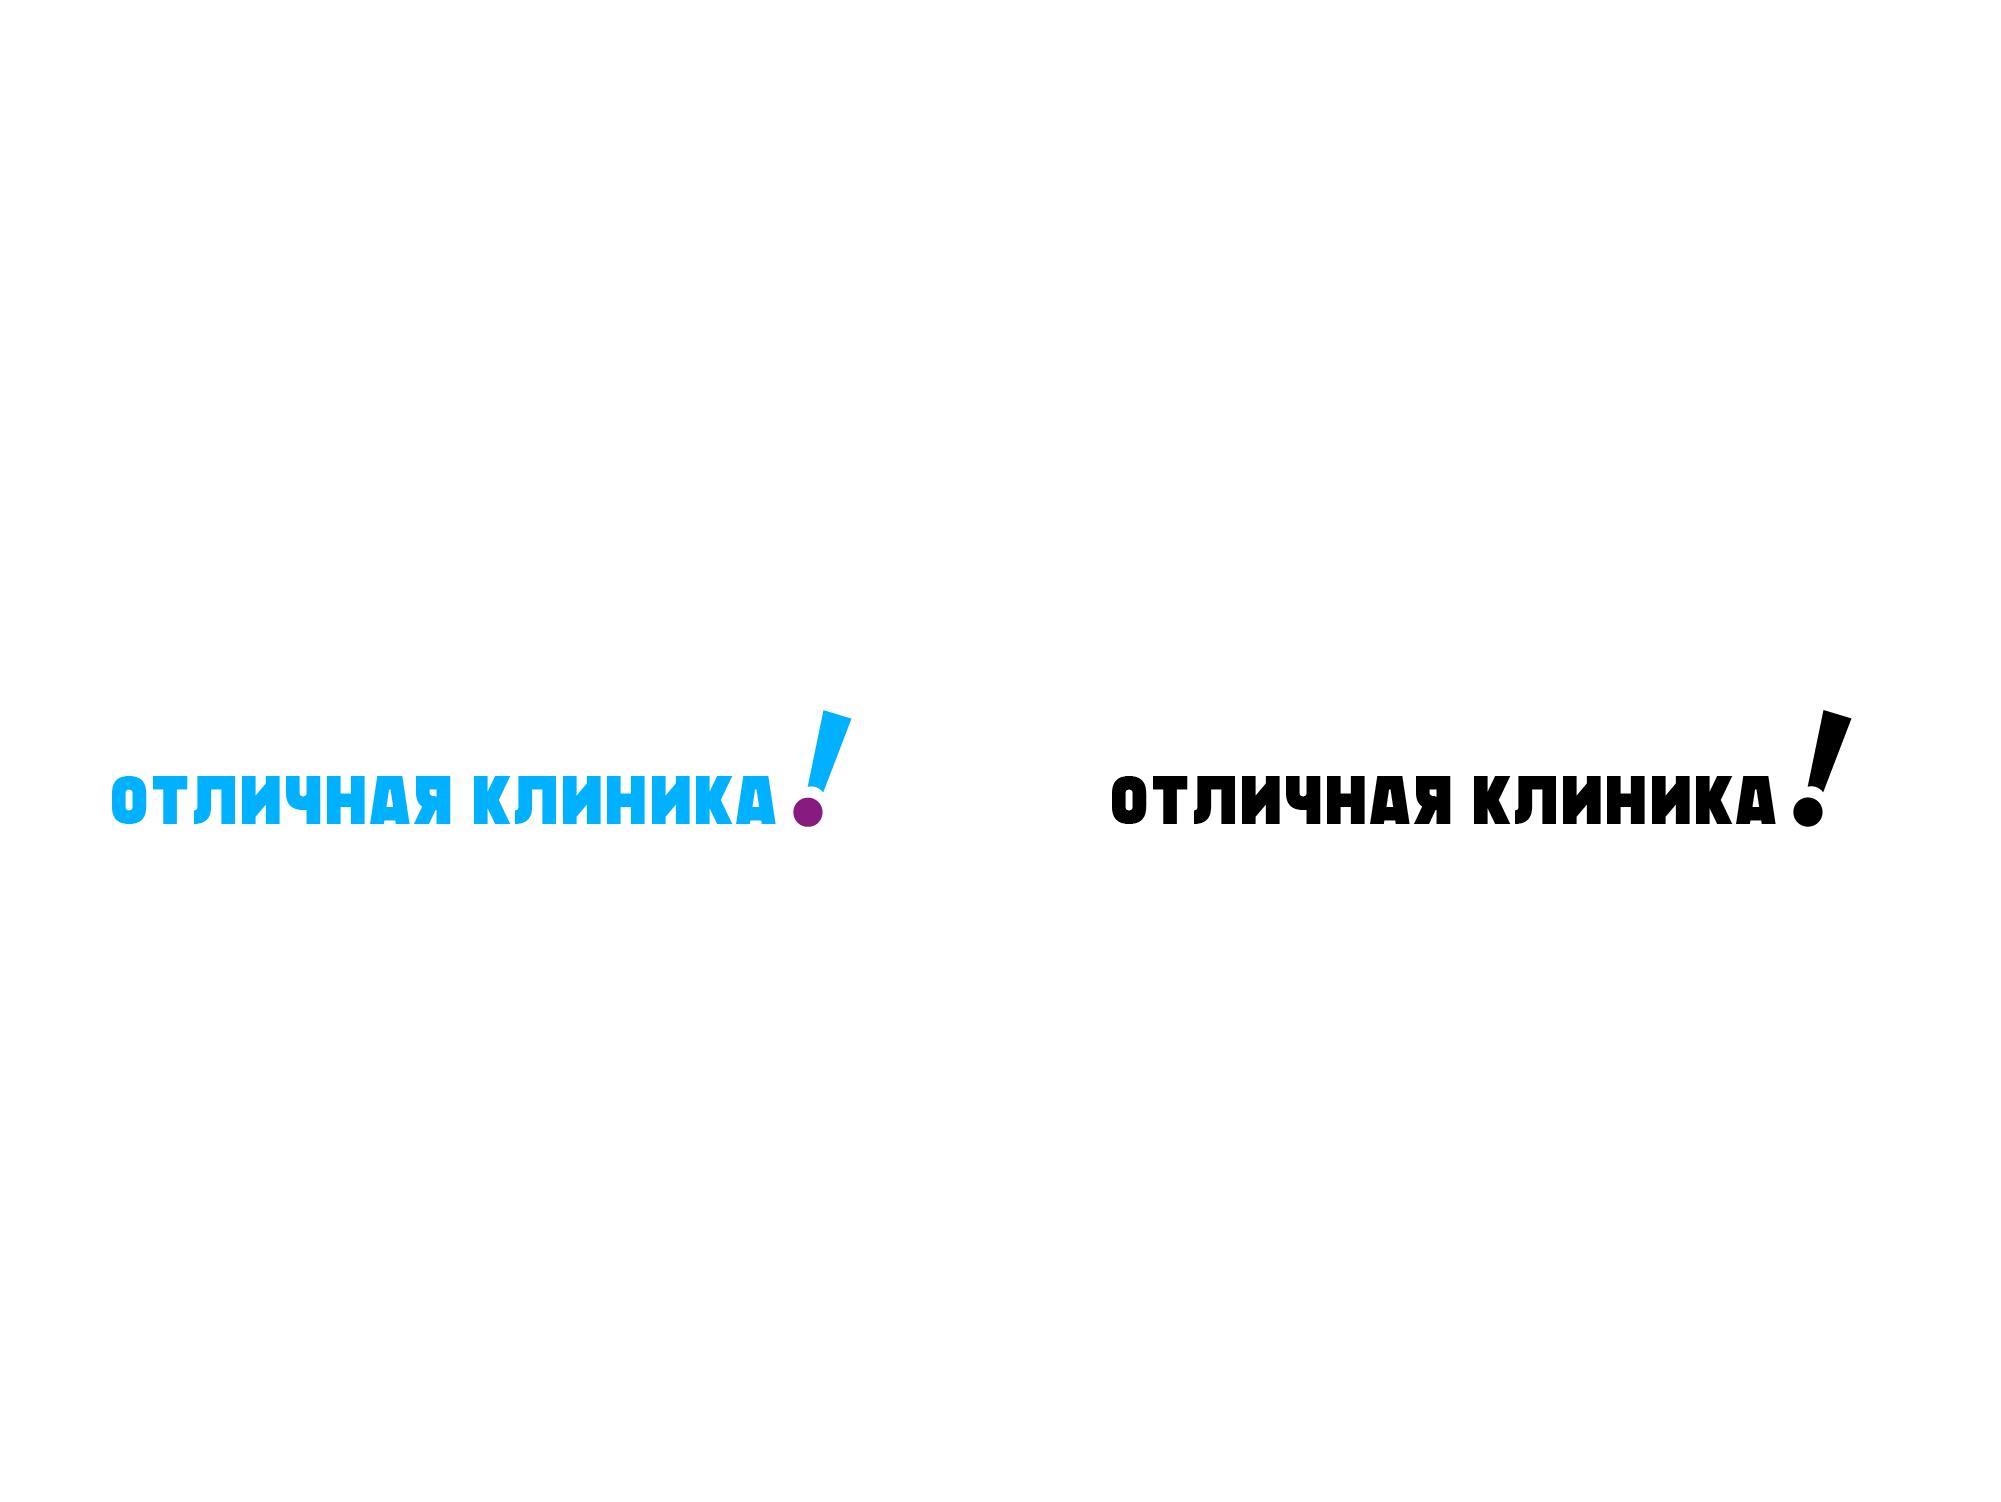 Логотип и фирменный стиль частной клиники фото f_5625c8e05930a931.png